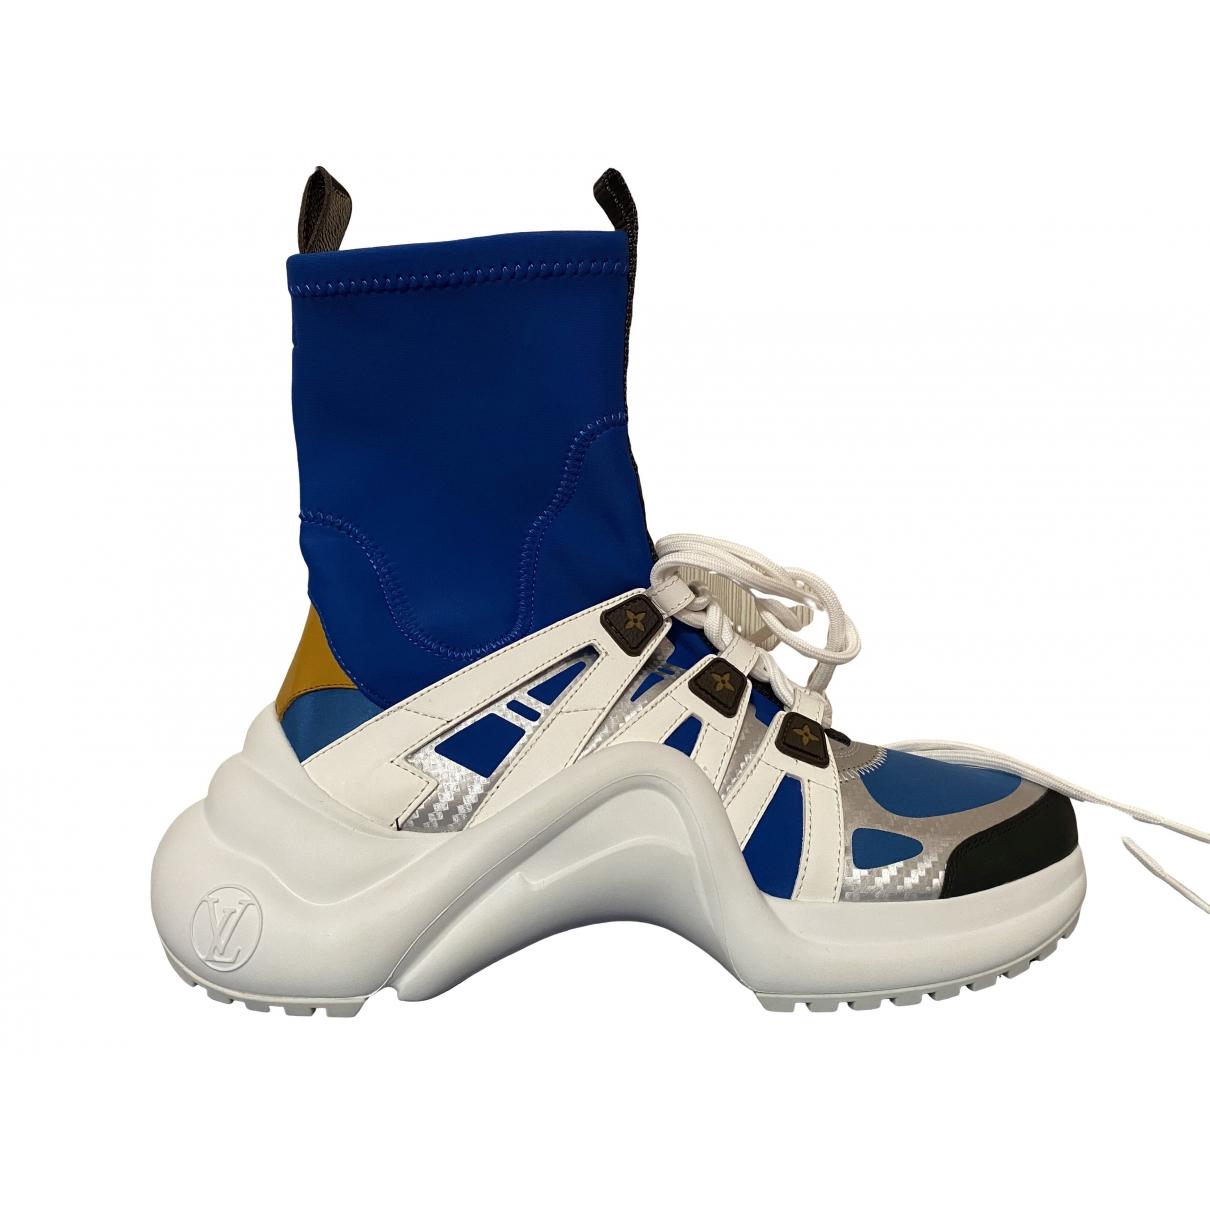 Louis Vuitton Archlight White Trainers for Women 38 EU